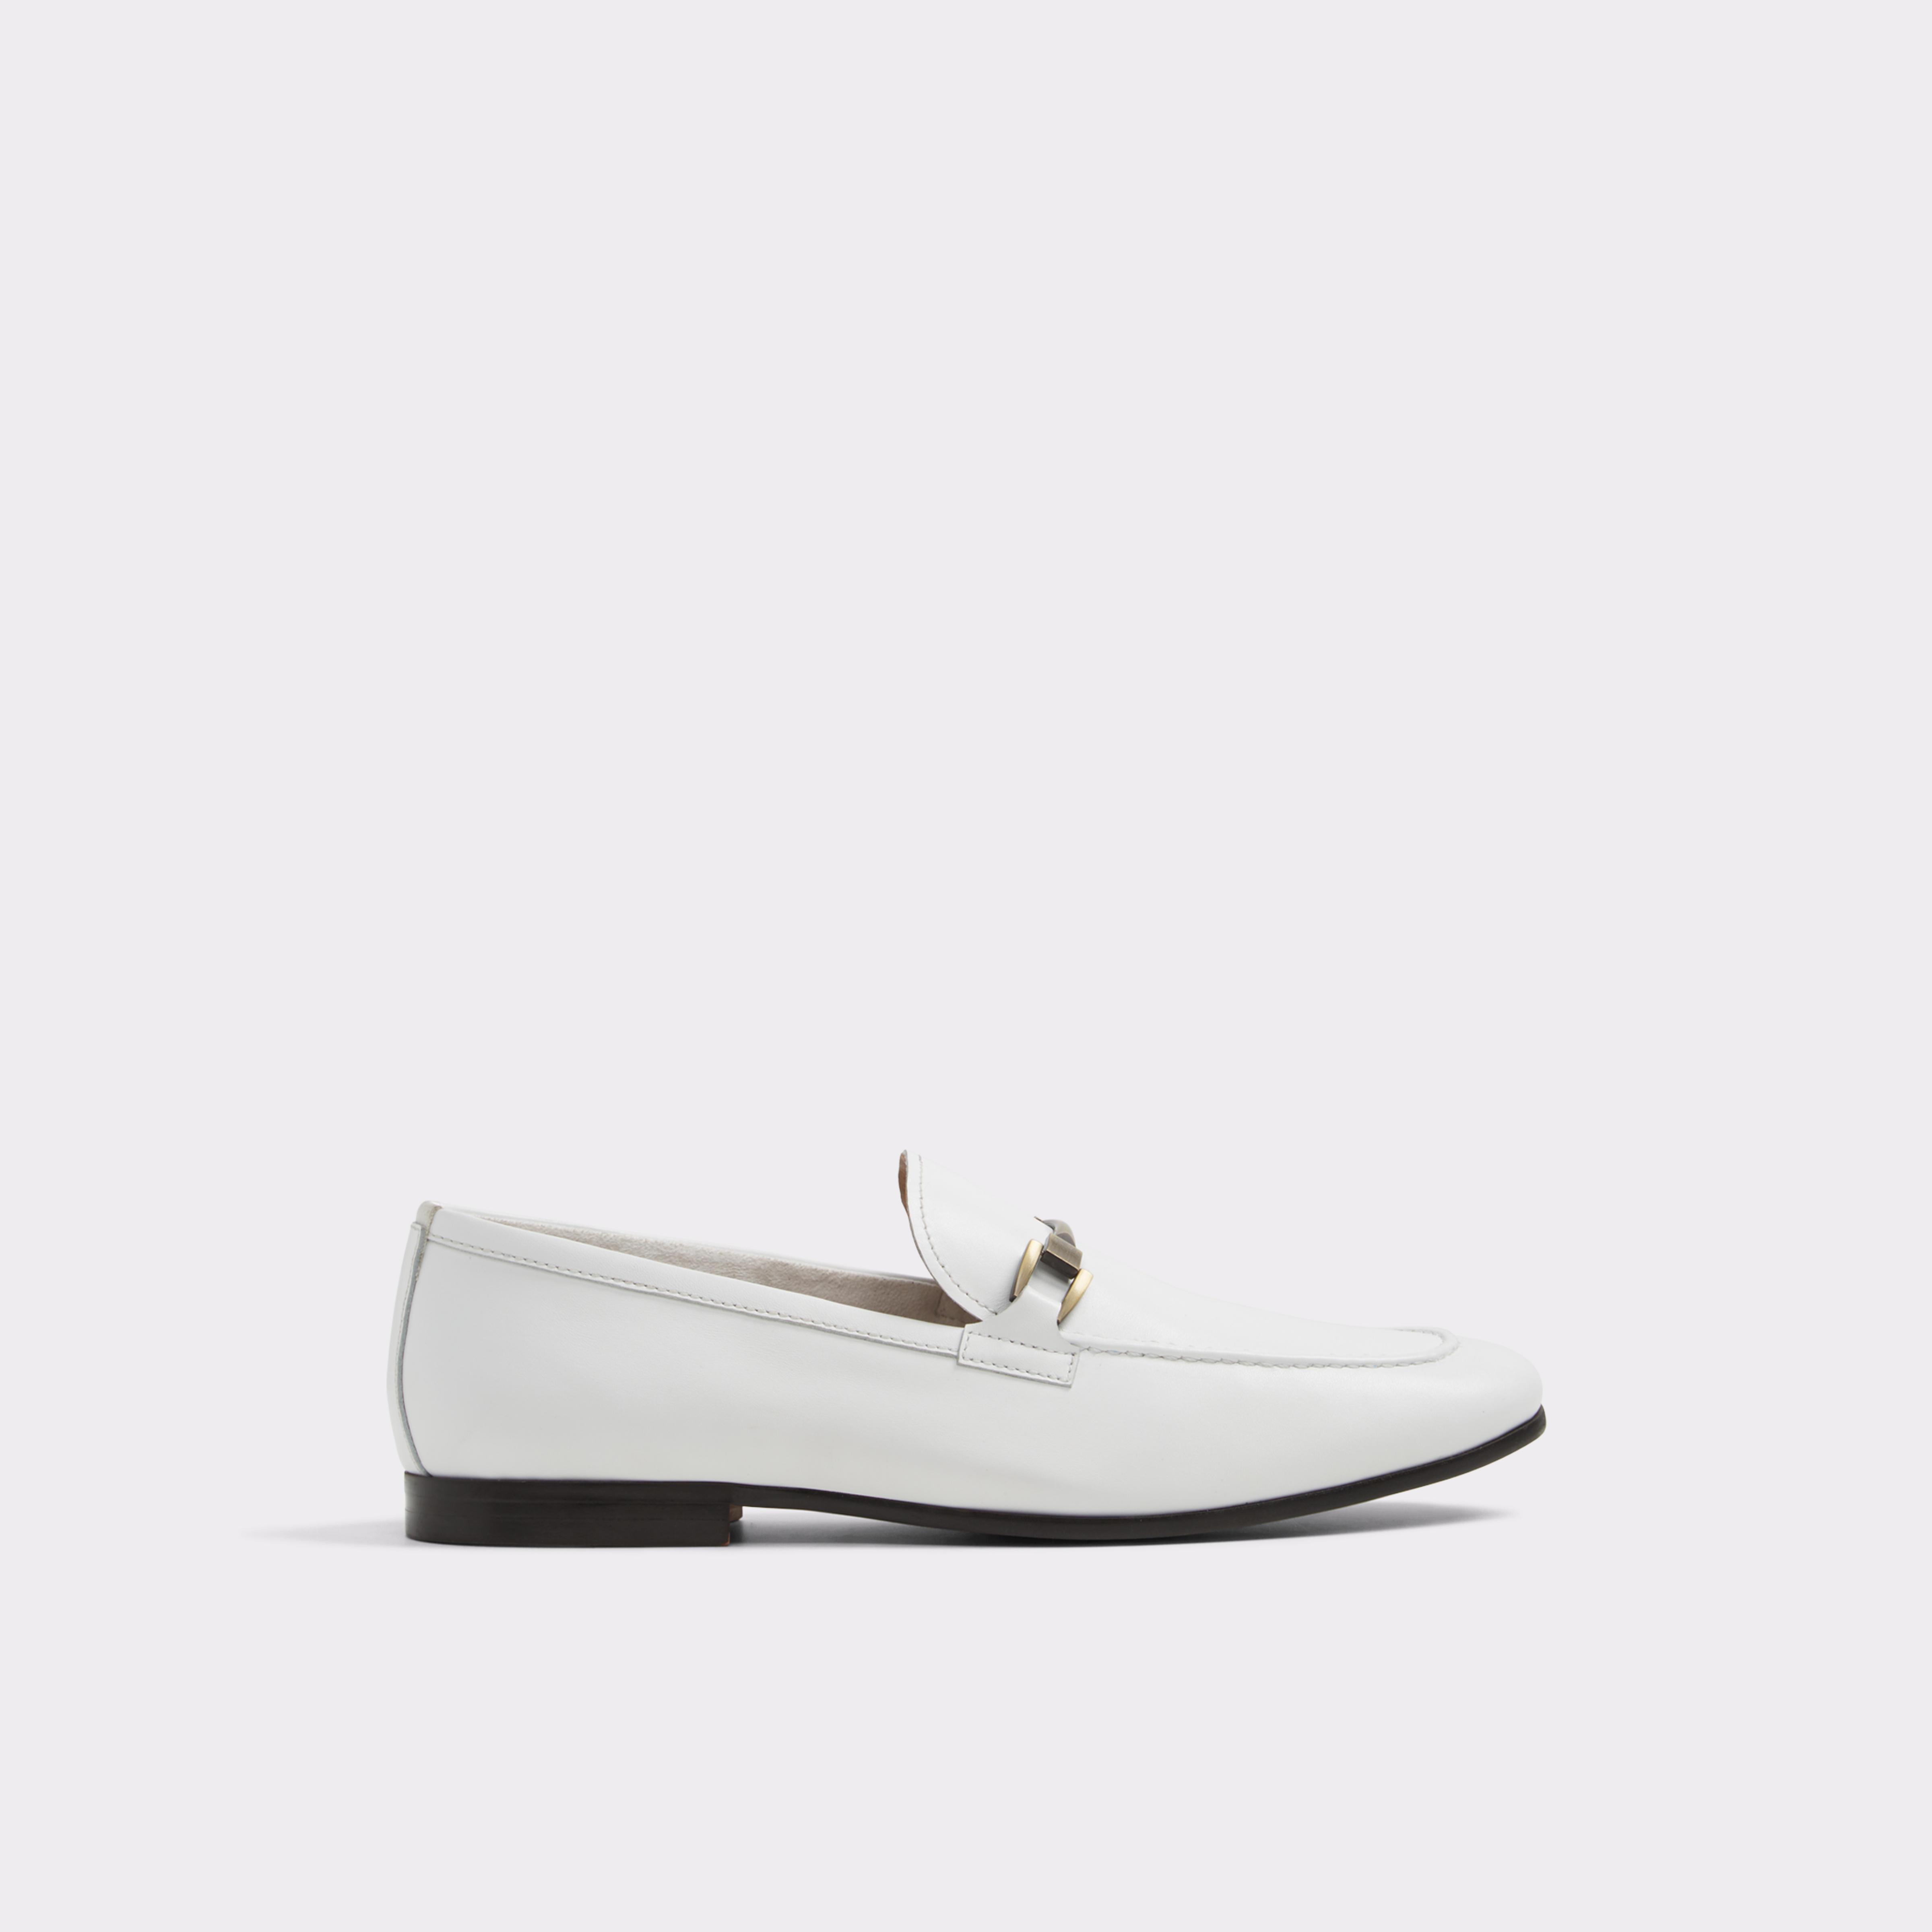 new style 1352c 5621e ALDO Leather Afaeniel in White/Cream (White) for Men - Lyst